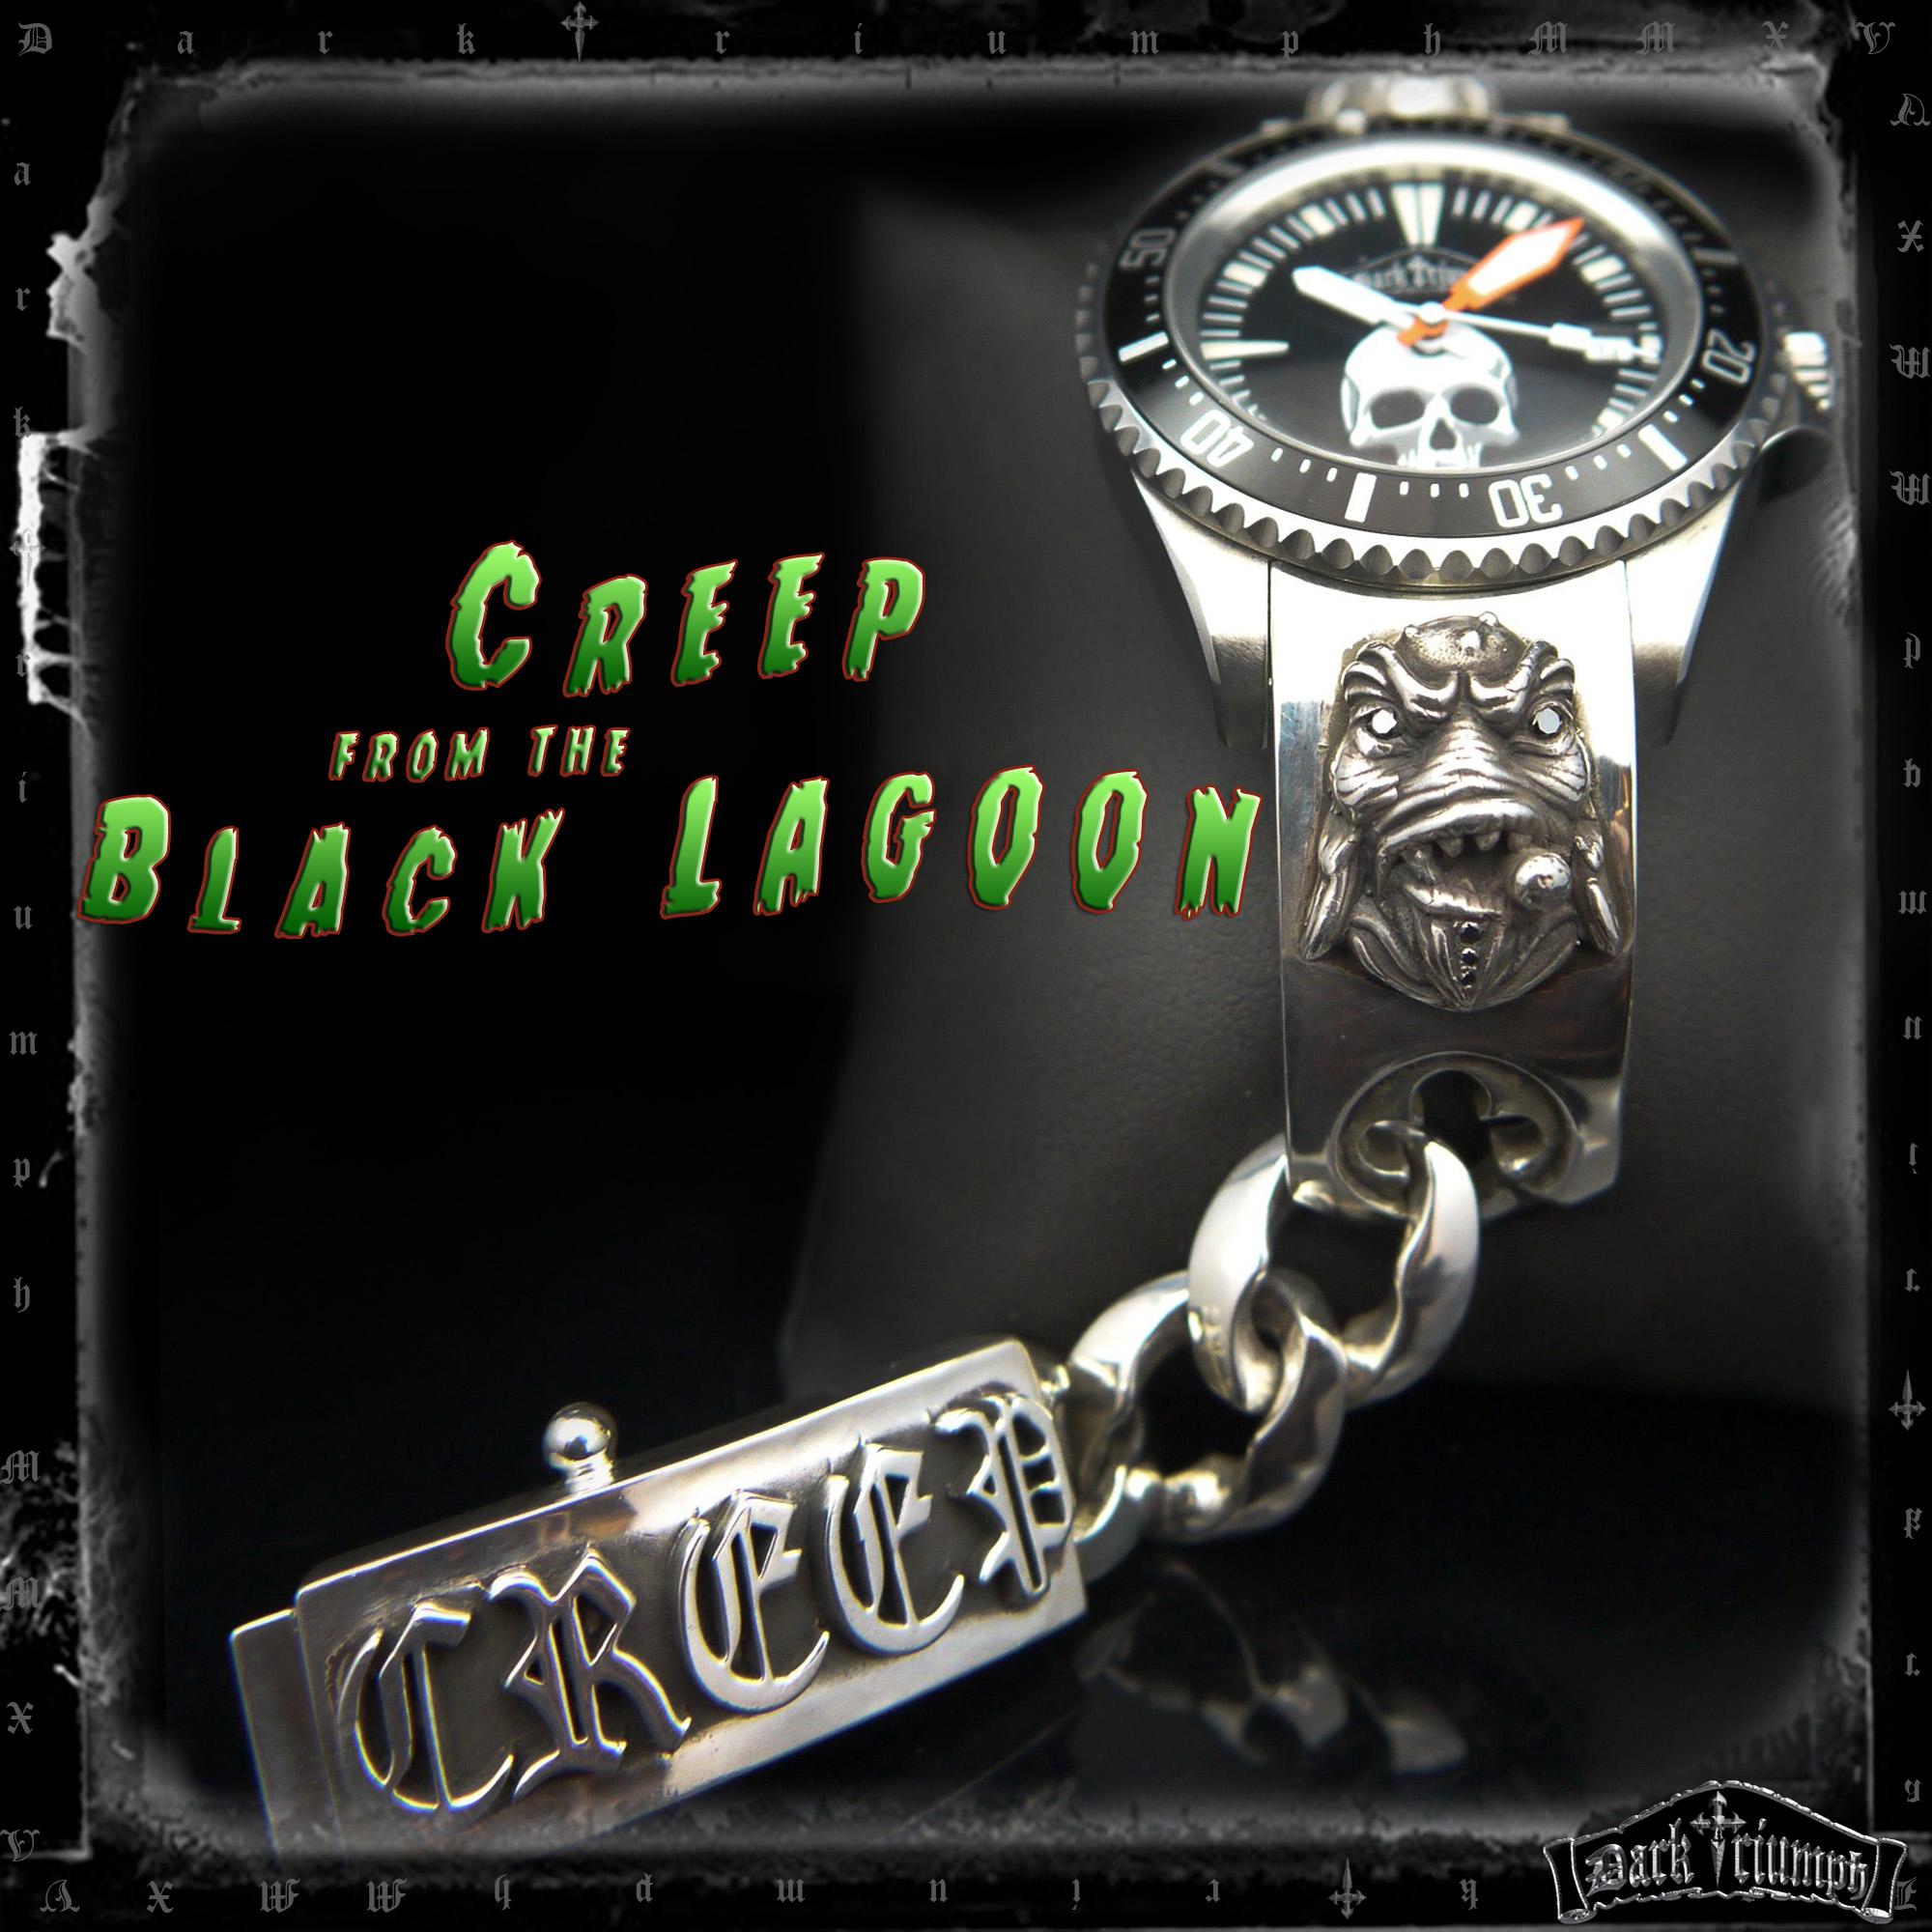 creep-black-lagoon-bucherer-titled.jpg